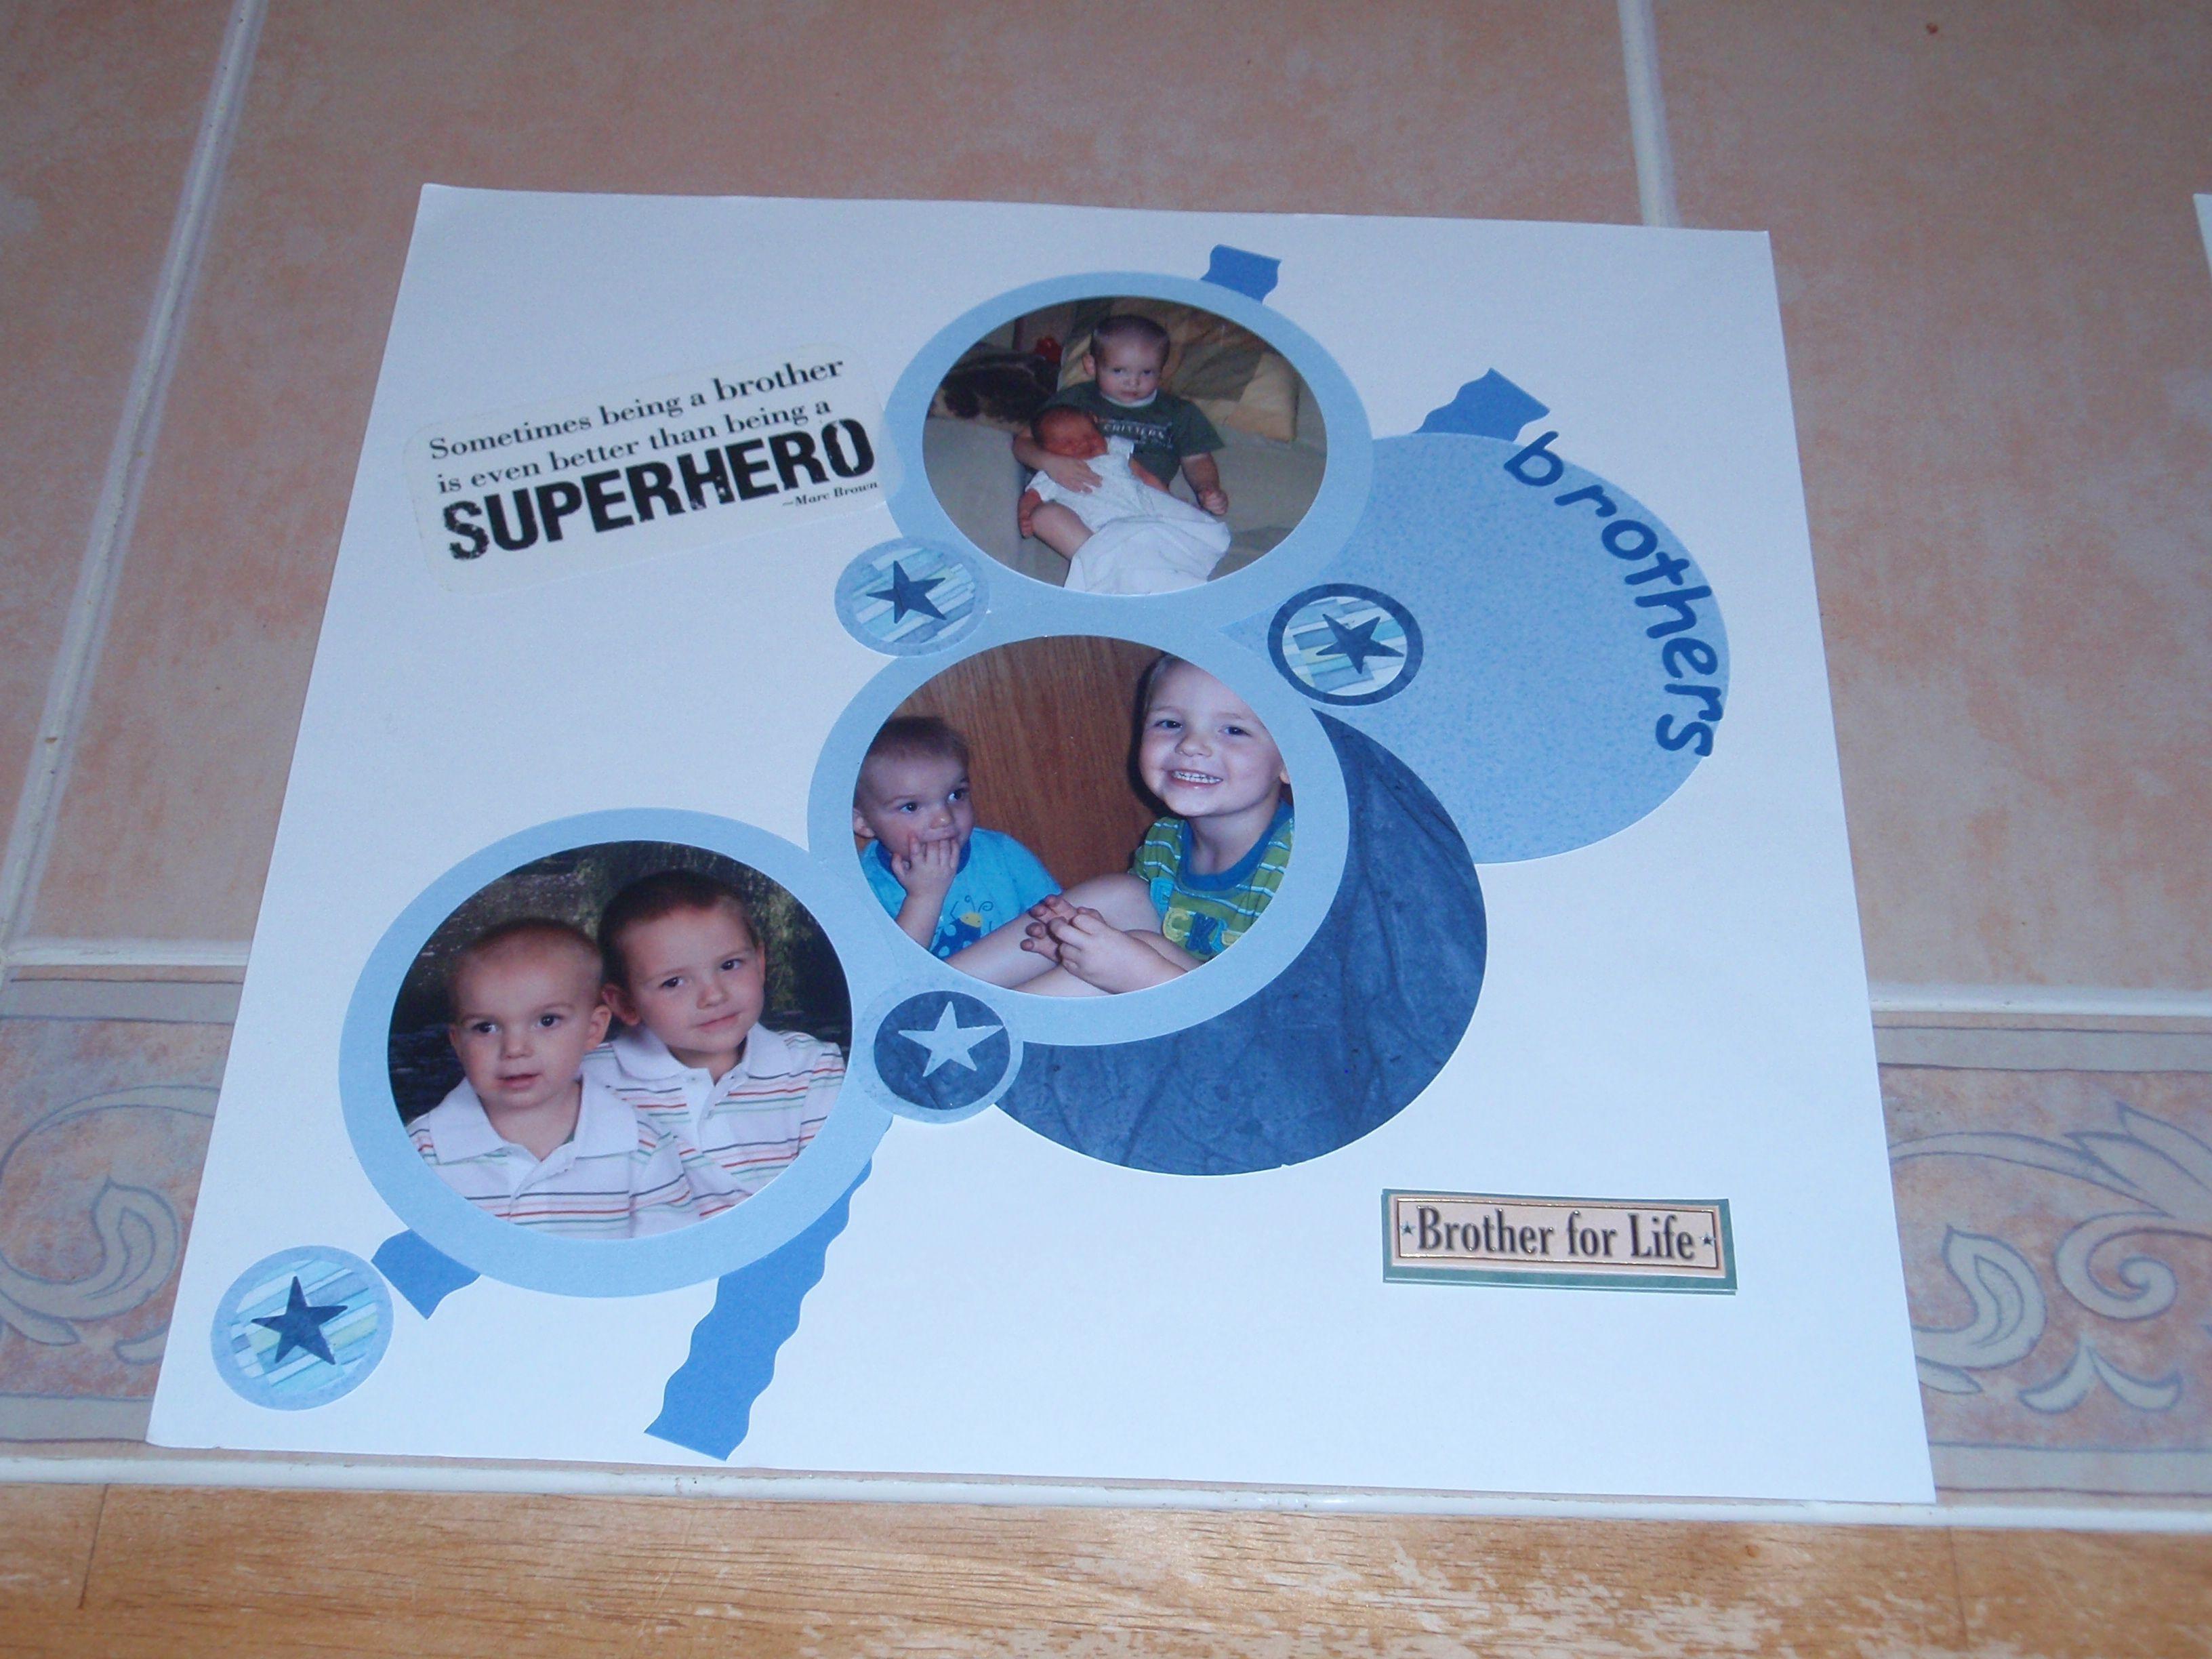 Family scrapbook ideas on pinterest - Brothers Family Scrapbook